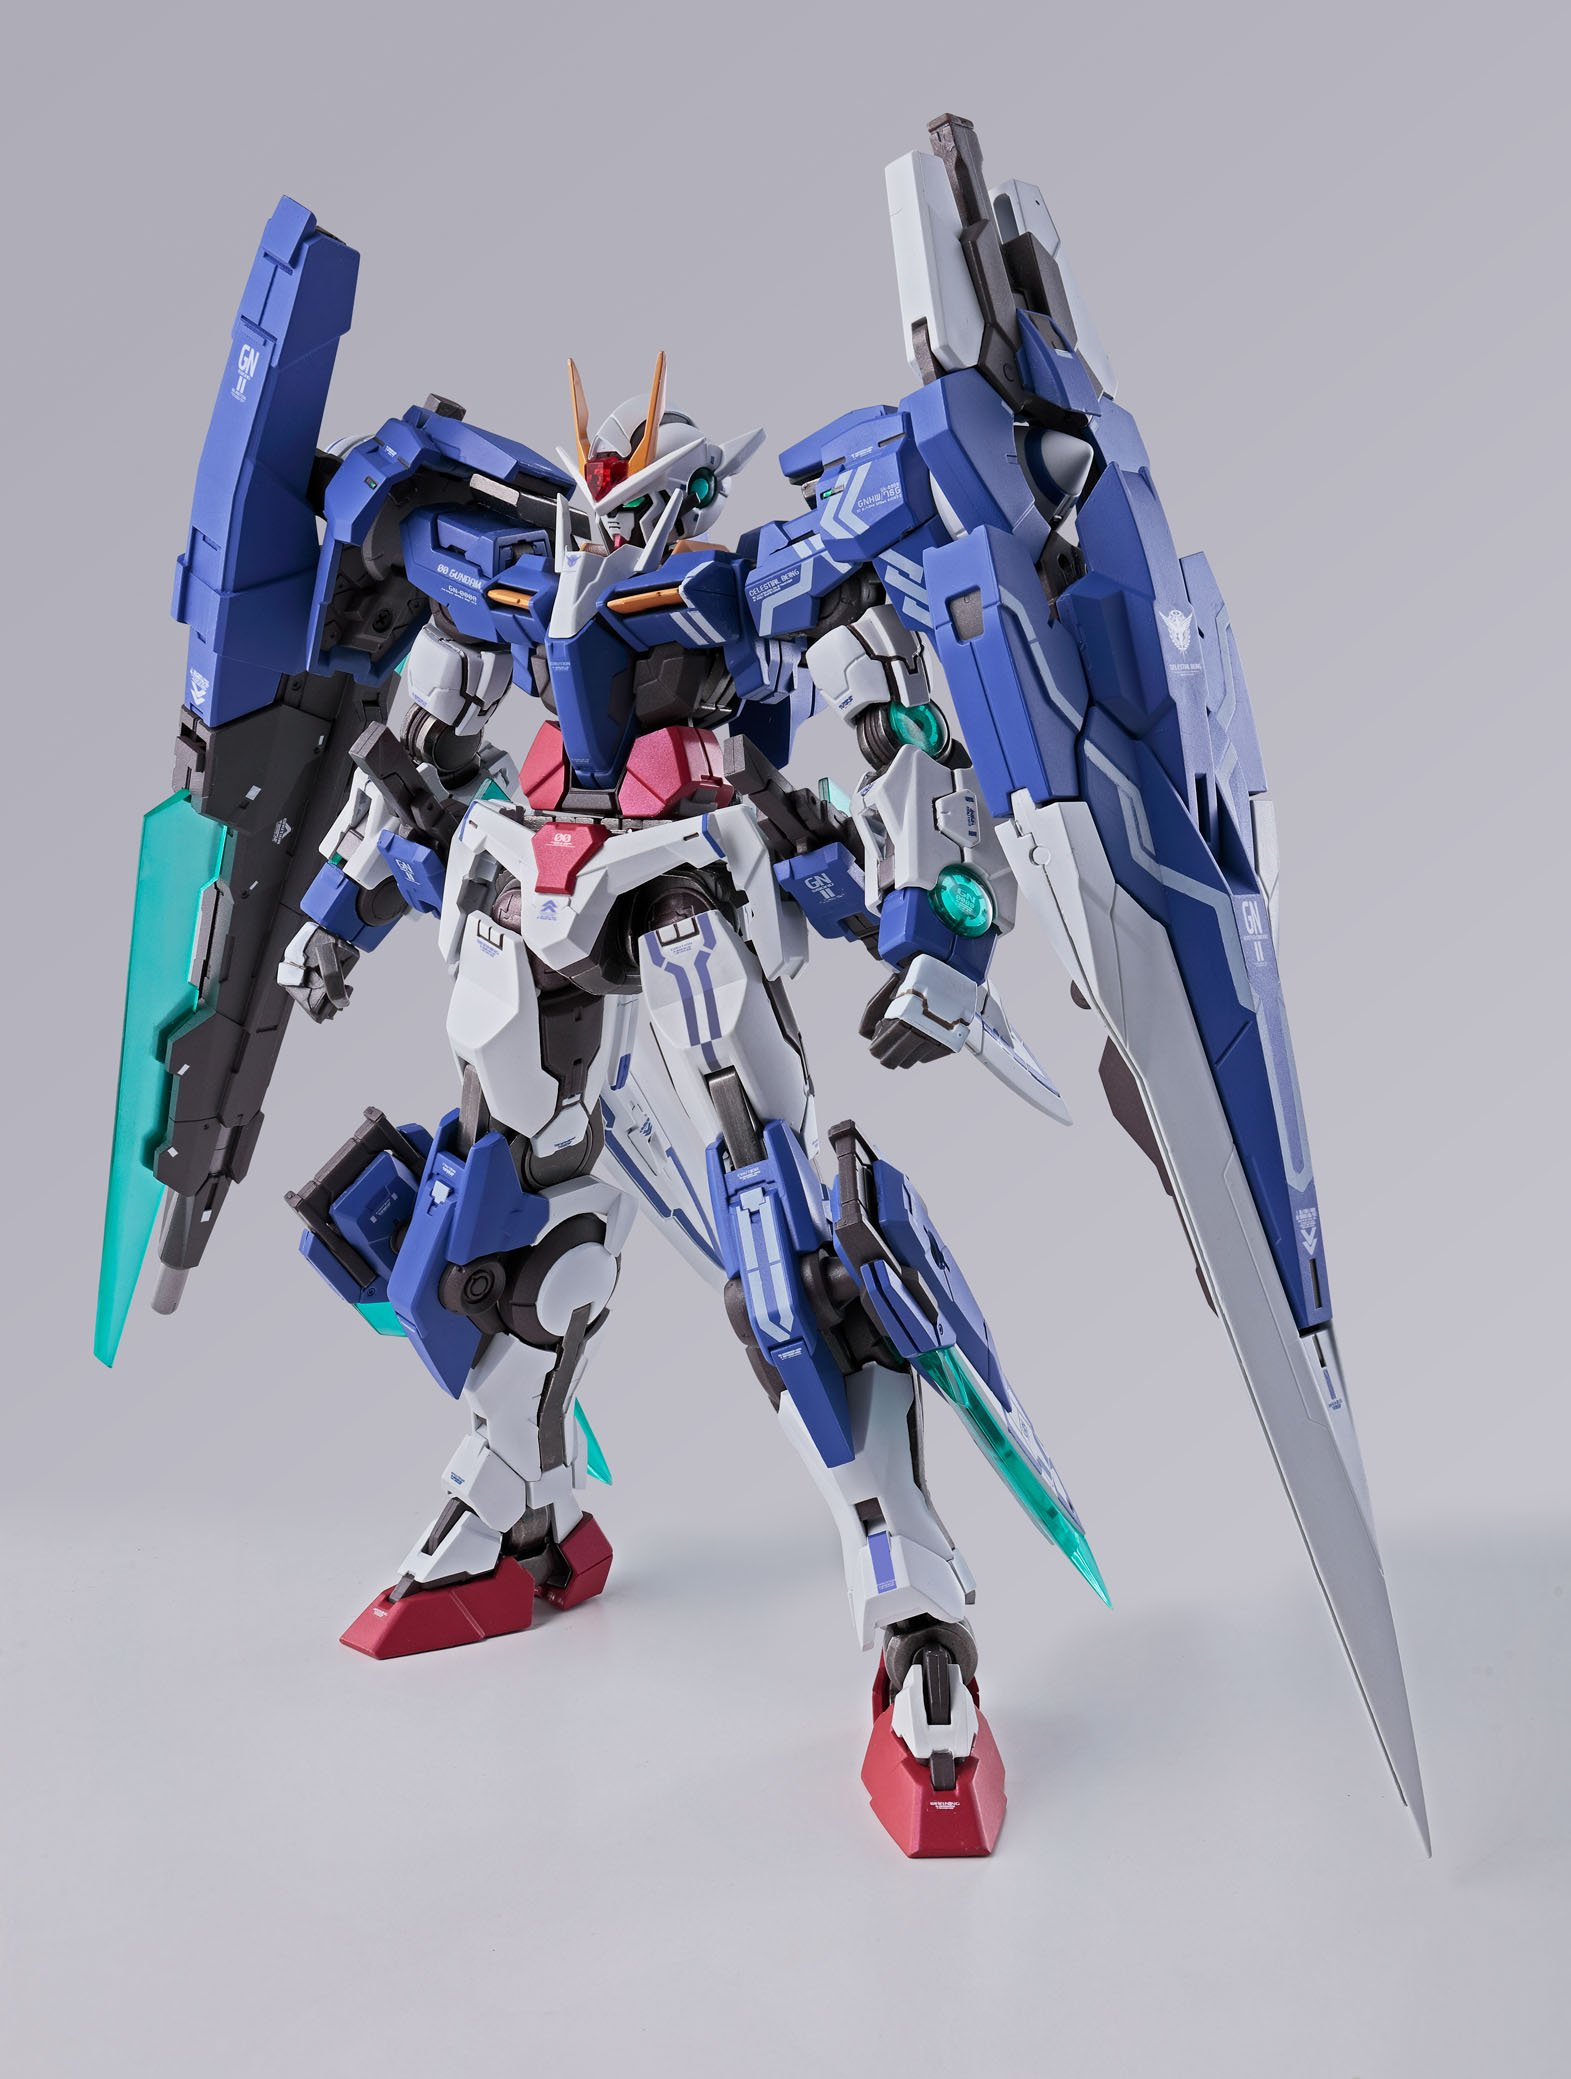 Bandai Gundam Metal Build Gundam Seven Sword G Mobile Suit Gundam 00V Battlefield record Action Figure by